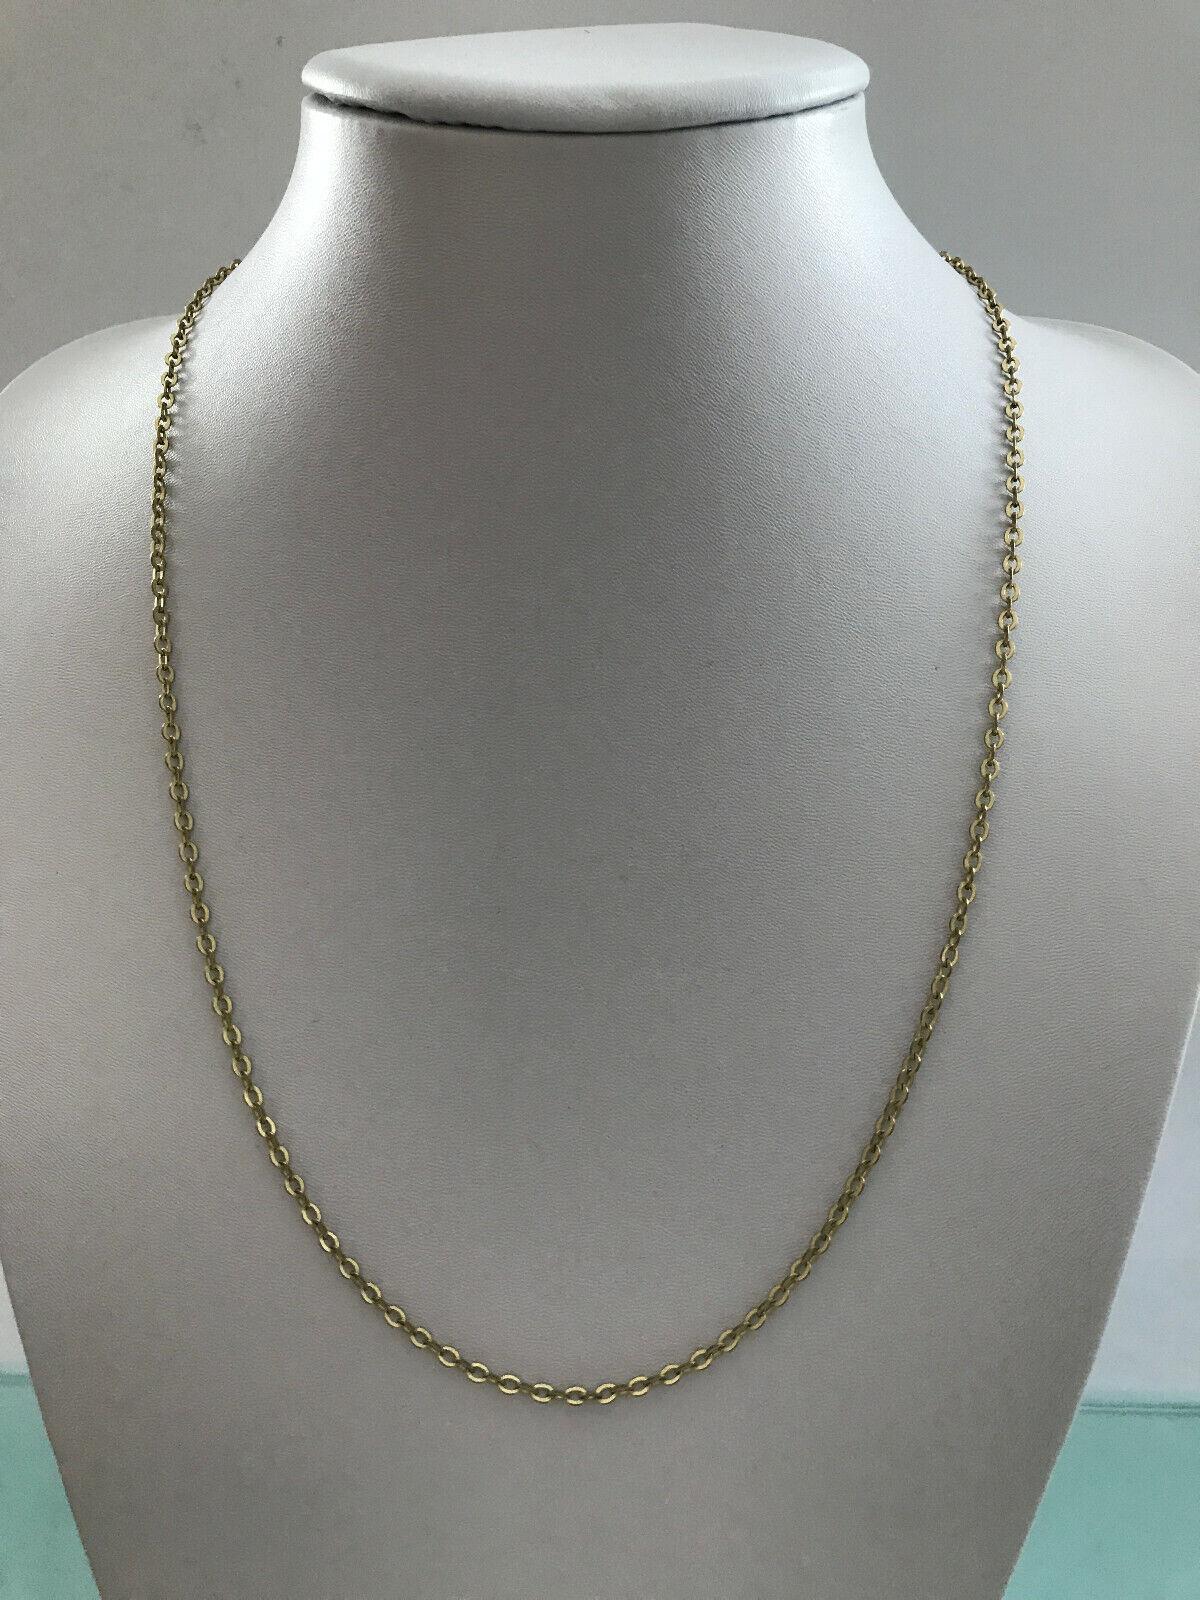 70er Jahre AM Double Kette Halskette Gliederkette 63 cm